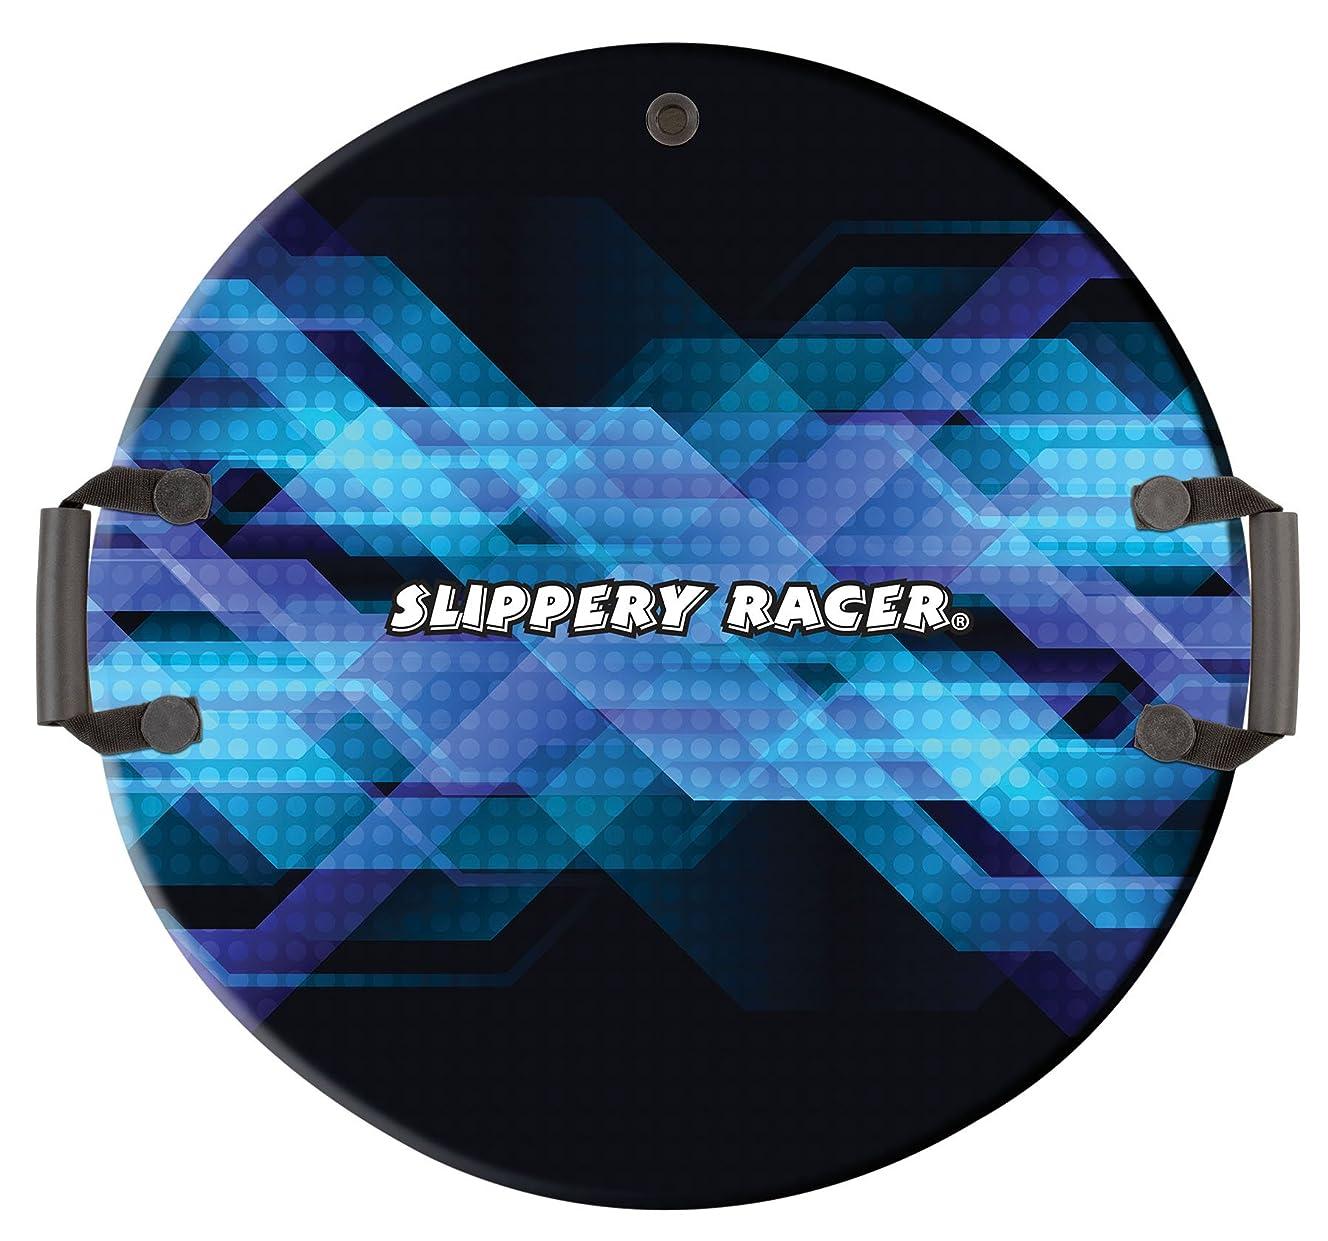 Slippery Racer Downhill Zeus Foam Saucer Snow Sled, Midnight Hologram